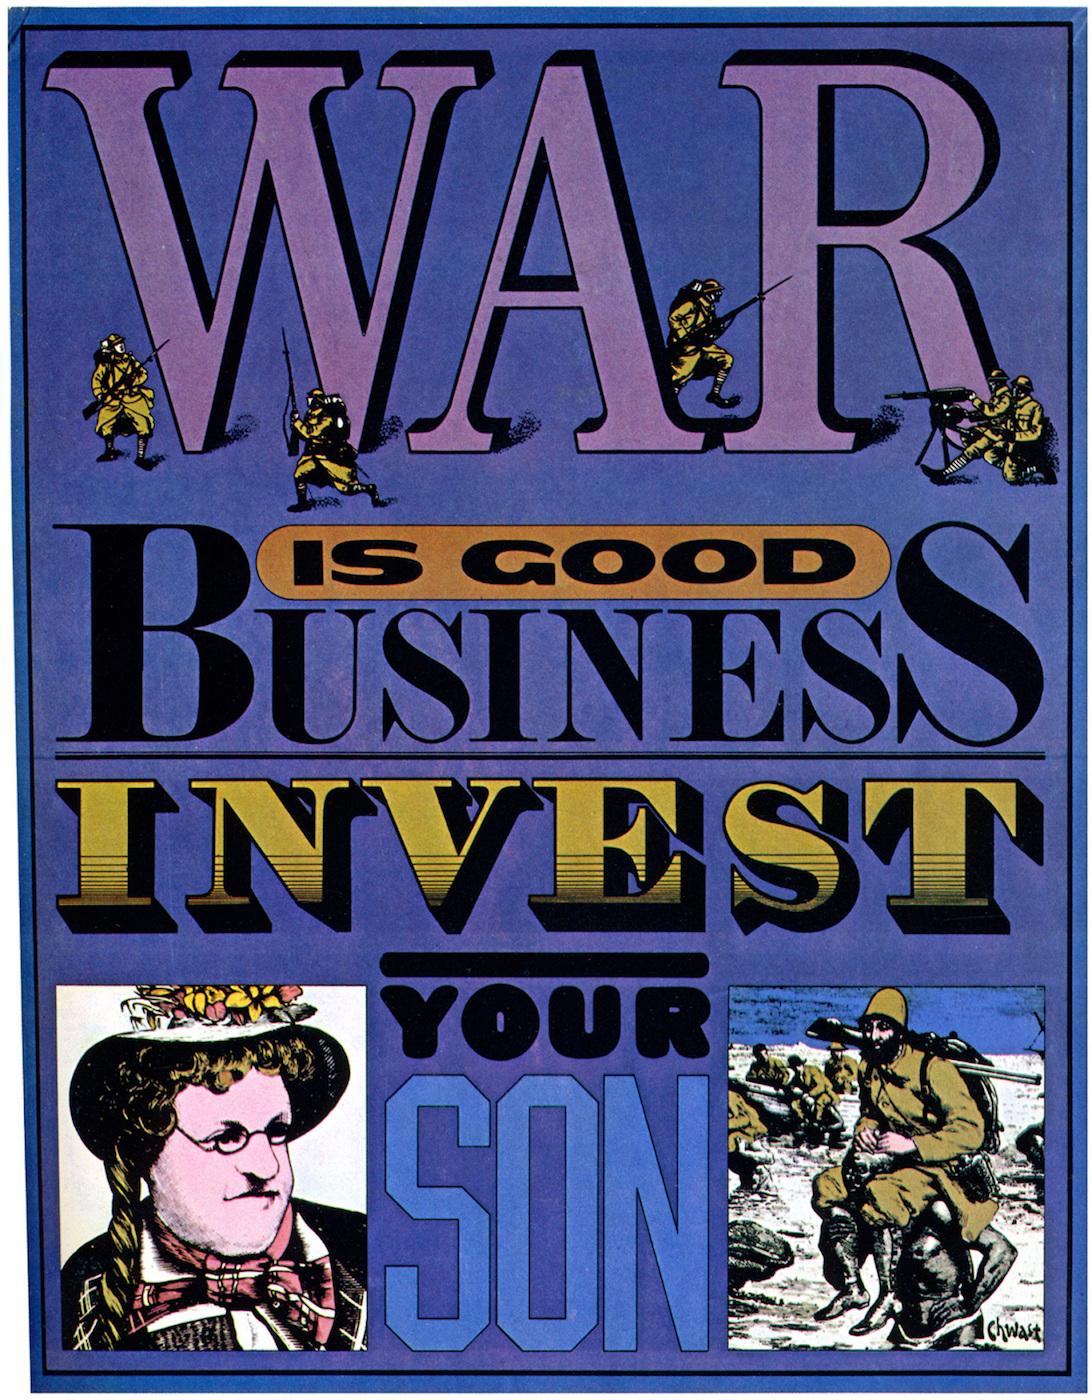 Seymour Chwast on War